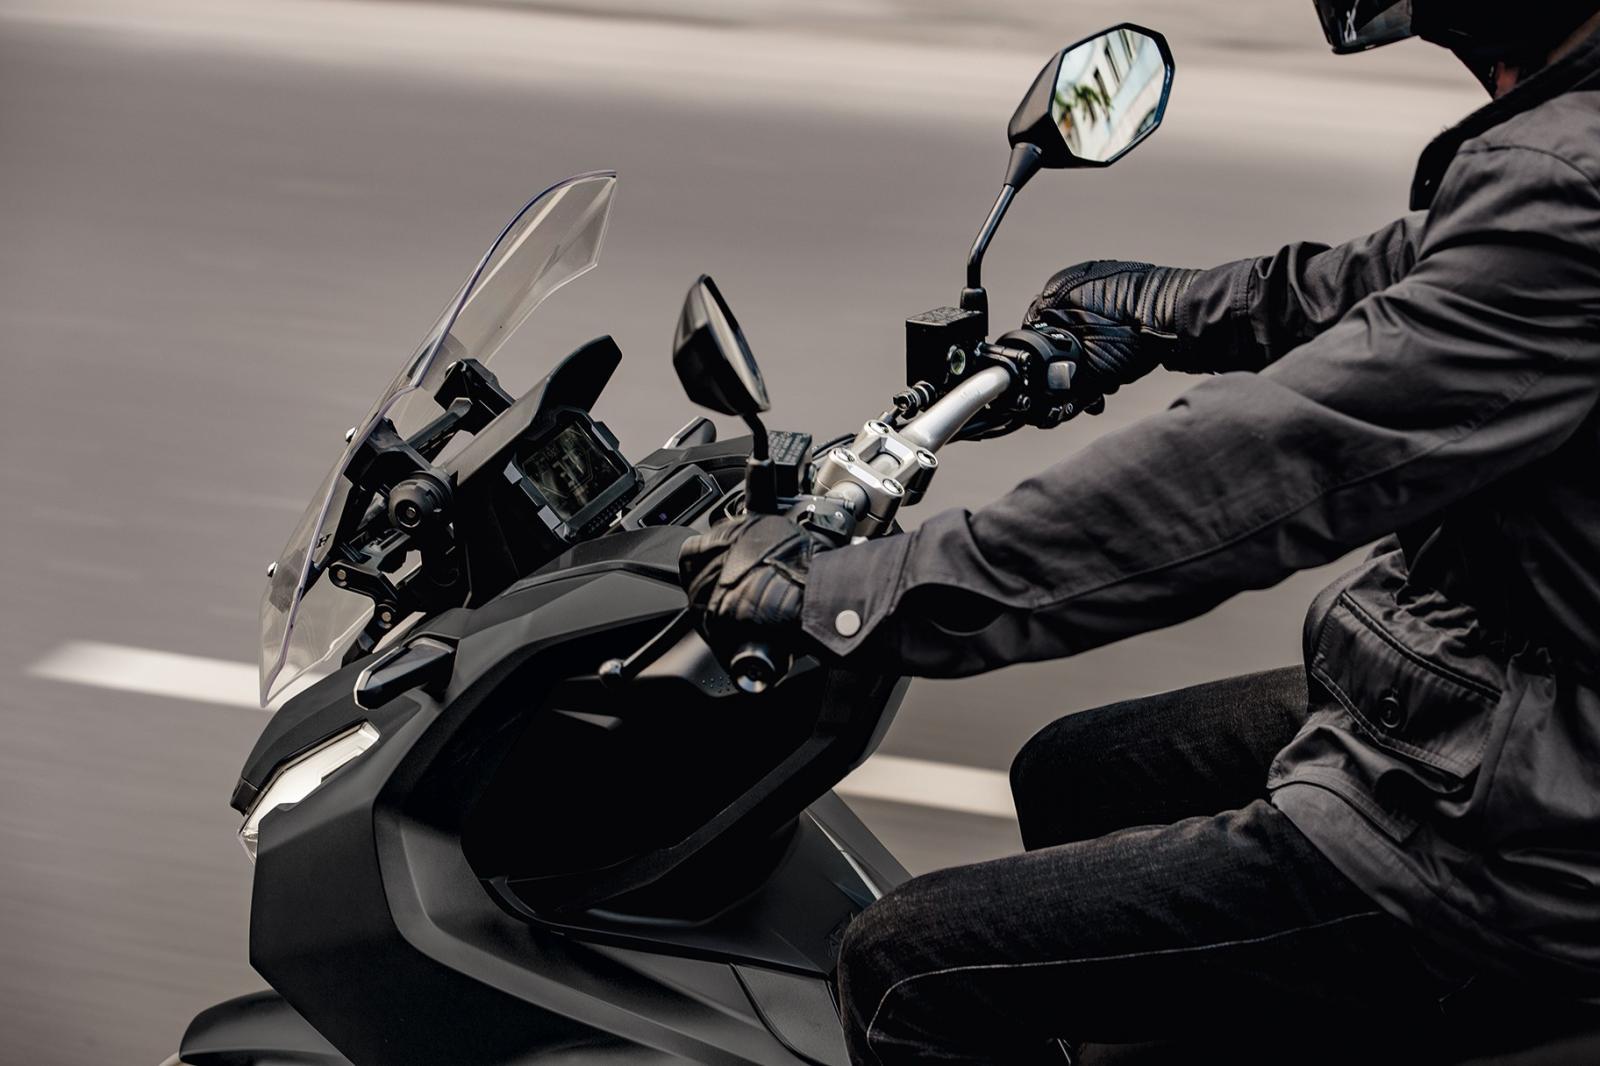 2021 Honda ADV 150